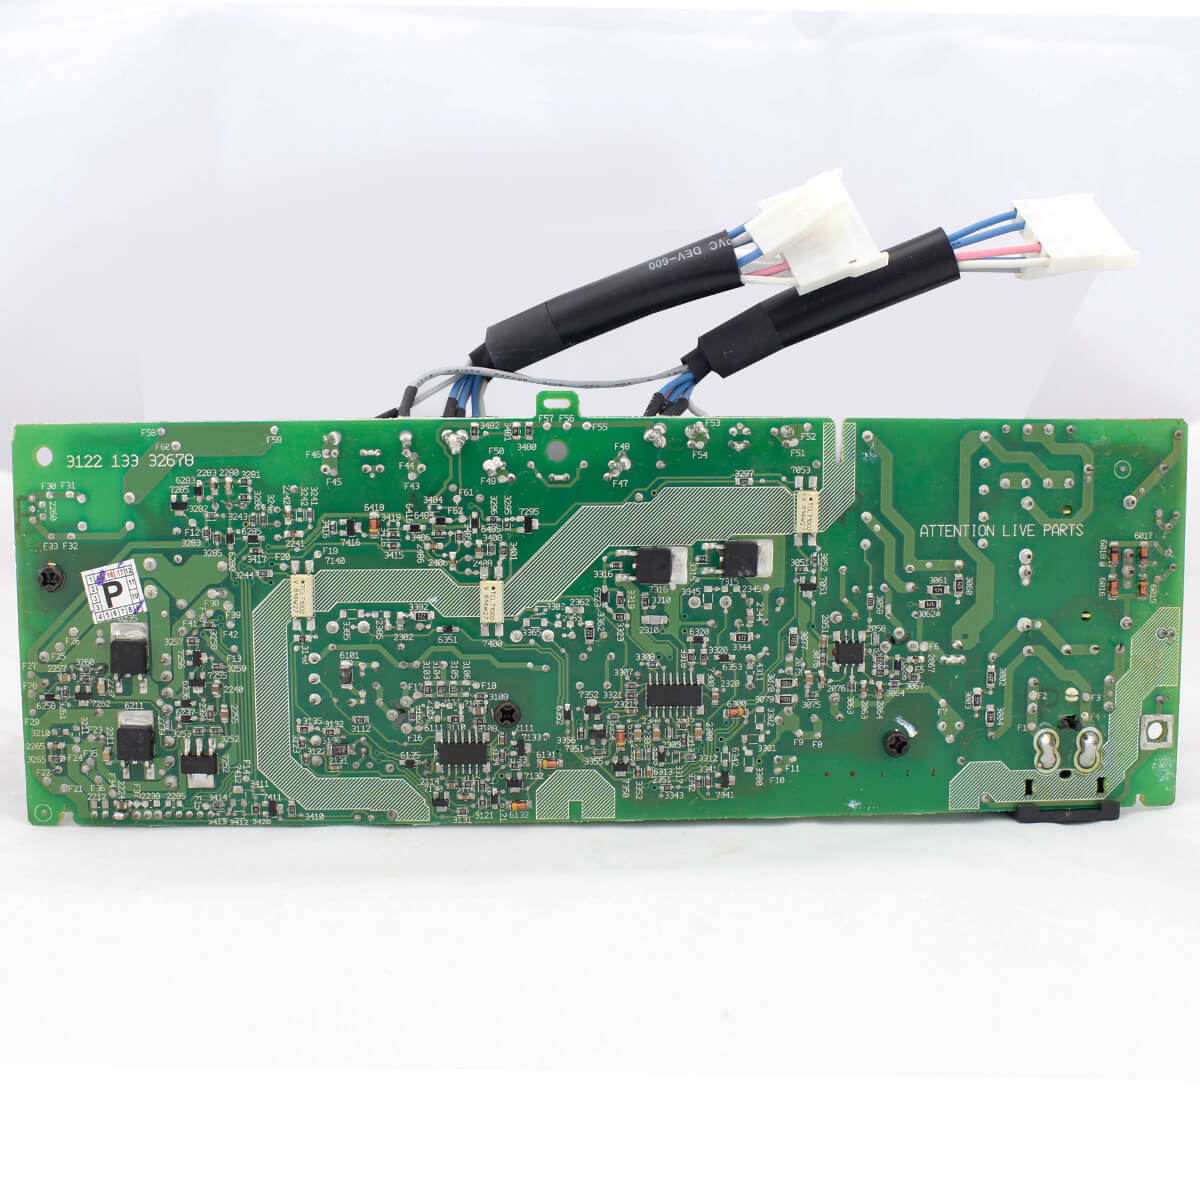 Placa Inverter Philips Pn P2004471 (3122 133 32678) - Nova